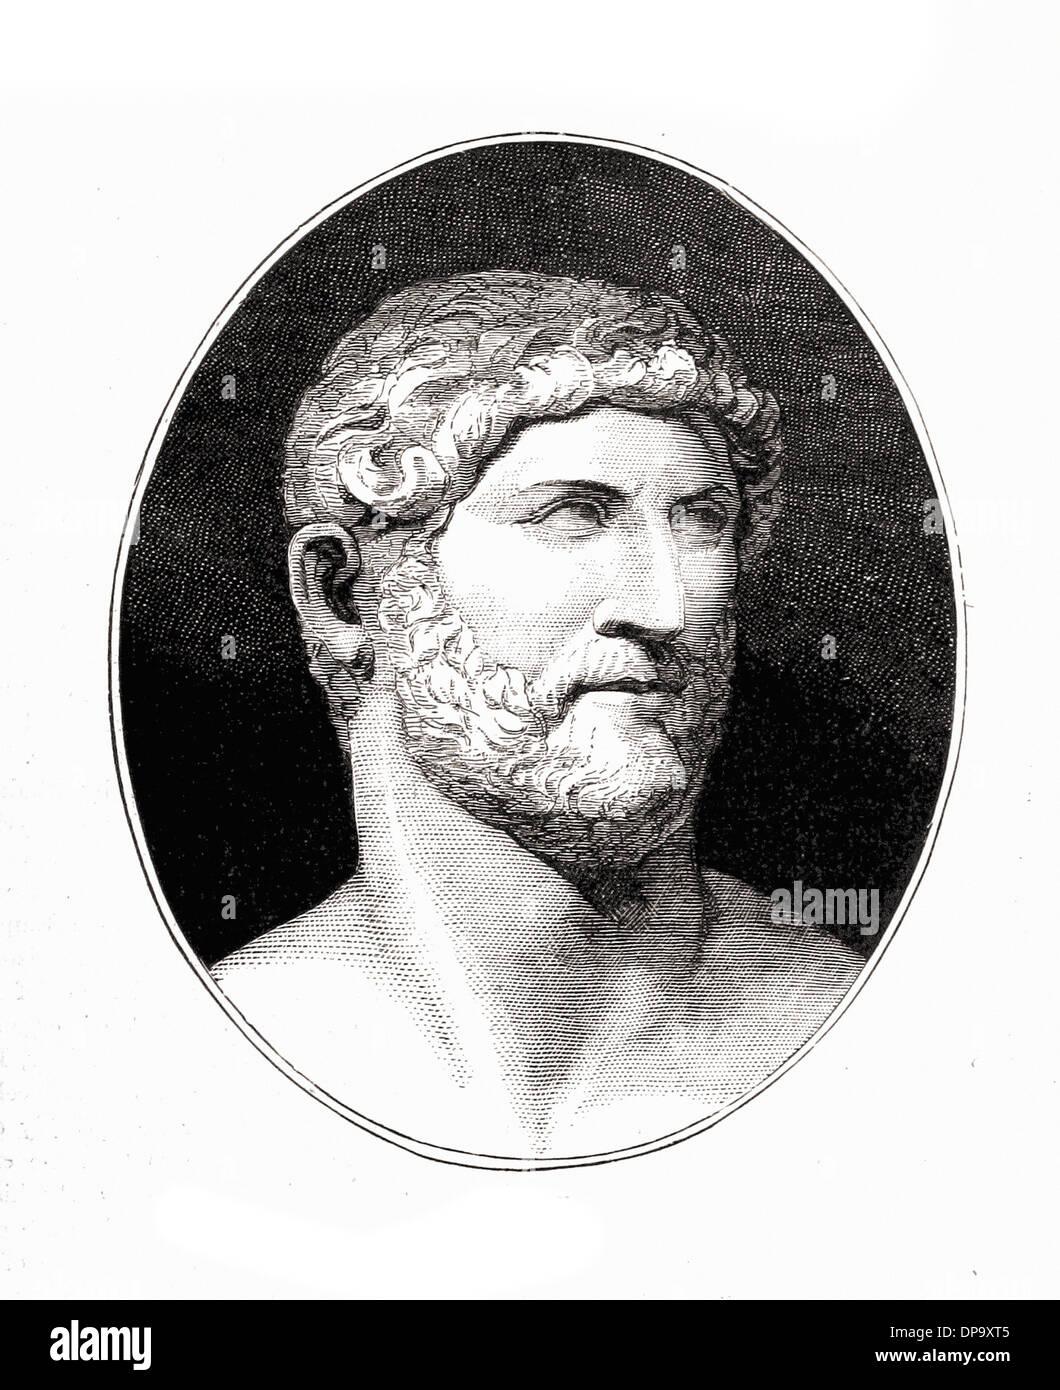 Portrait of Emperor Hadrian - British engraving XIX th Century - Stock Image